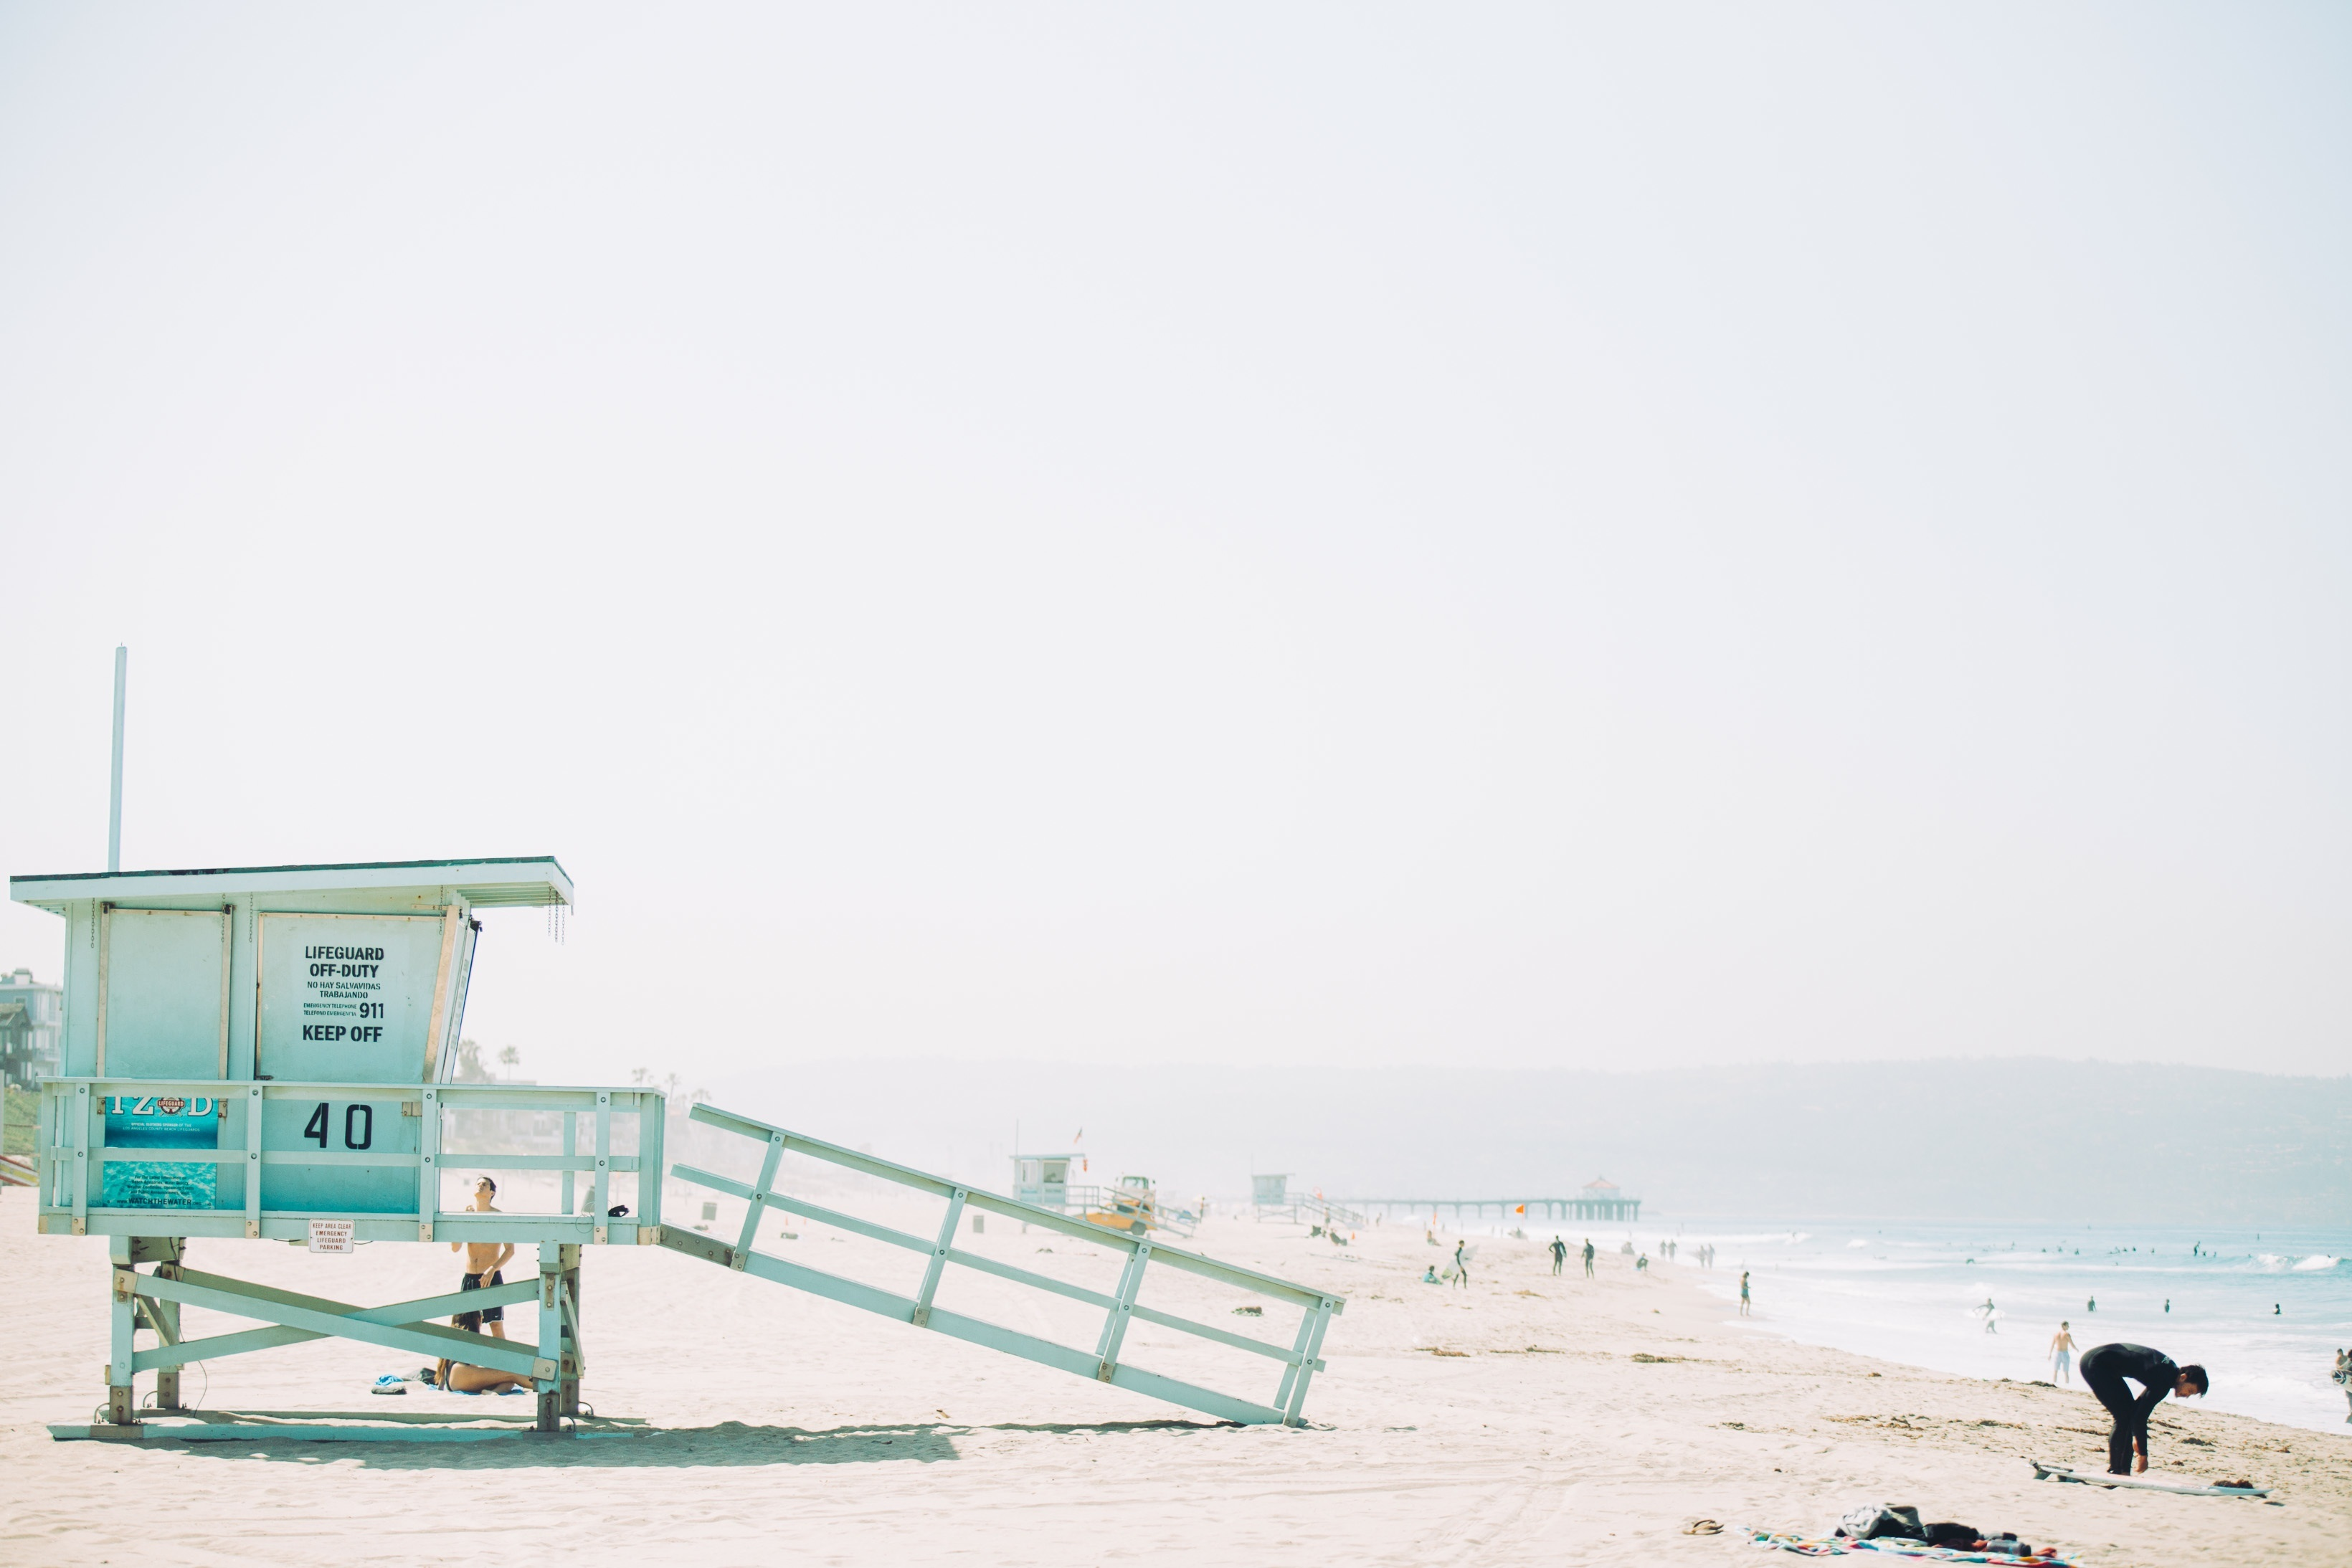 Lookout, beach, coast, lifeguards, people, people, sand, heat, summer